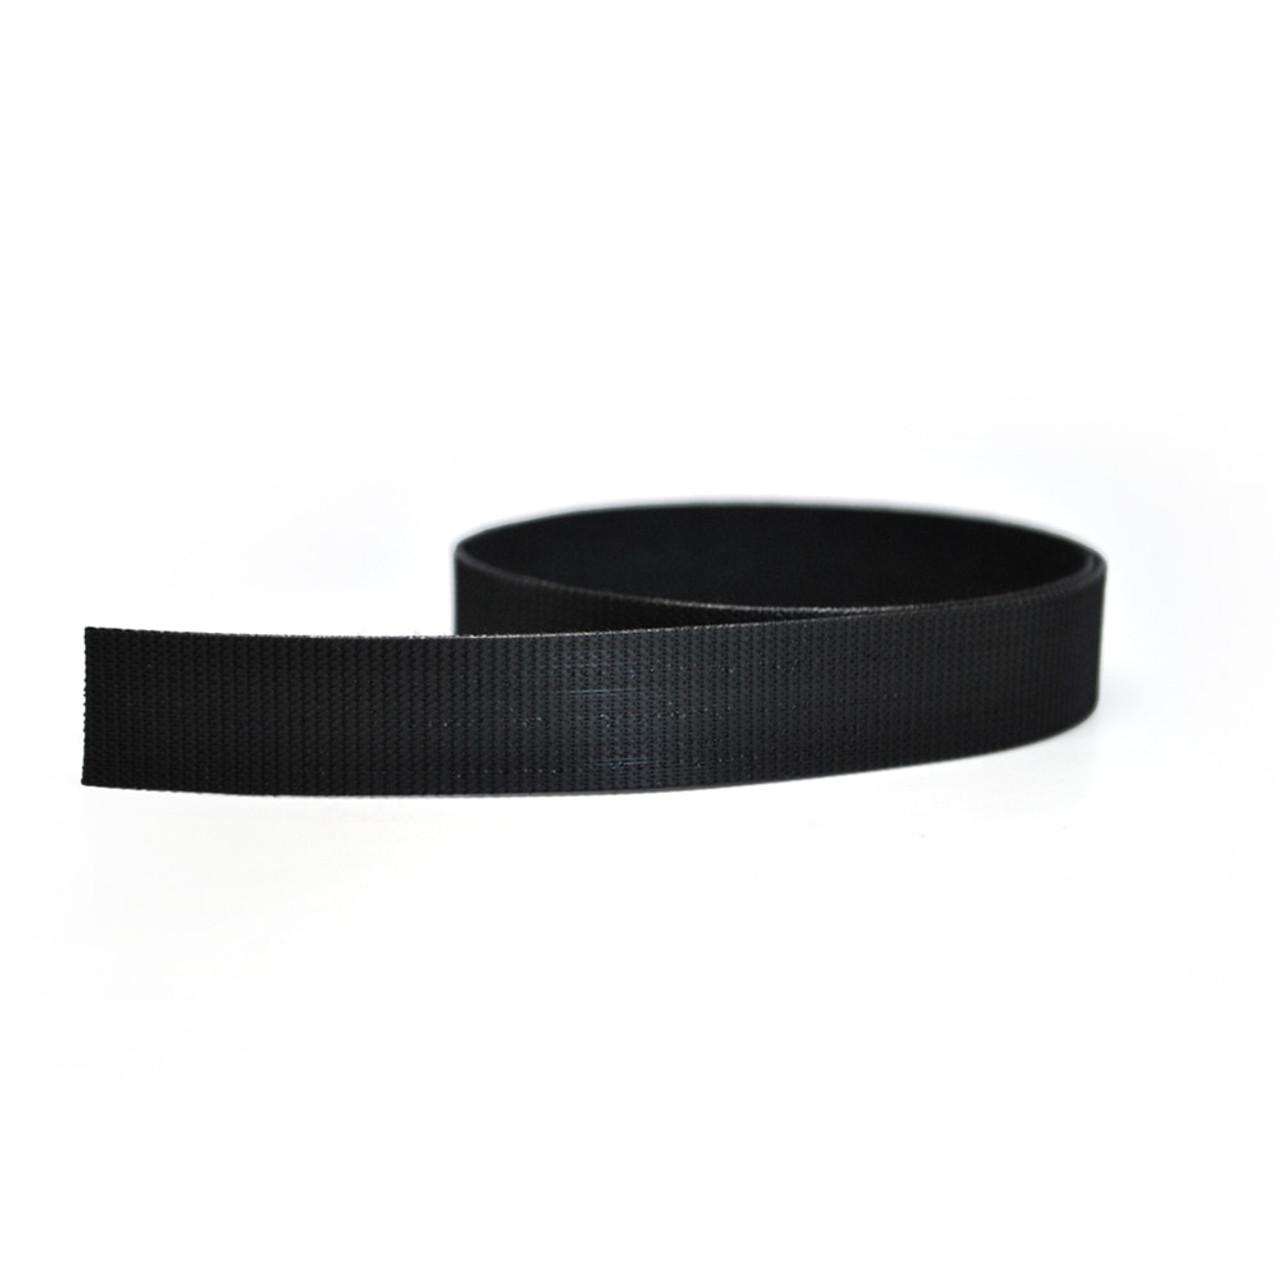 VELCRO® Brand QWIK Tie Tape Black / Velcro Straps - Bundling Straps - Velcro Tie - Velcro Strap